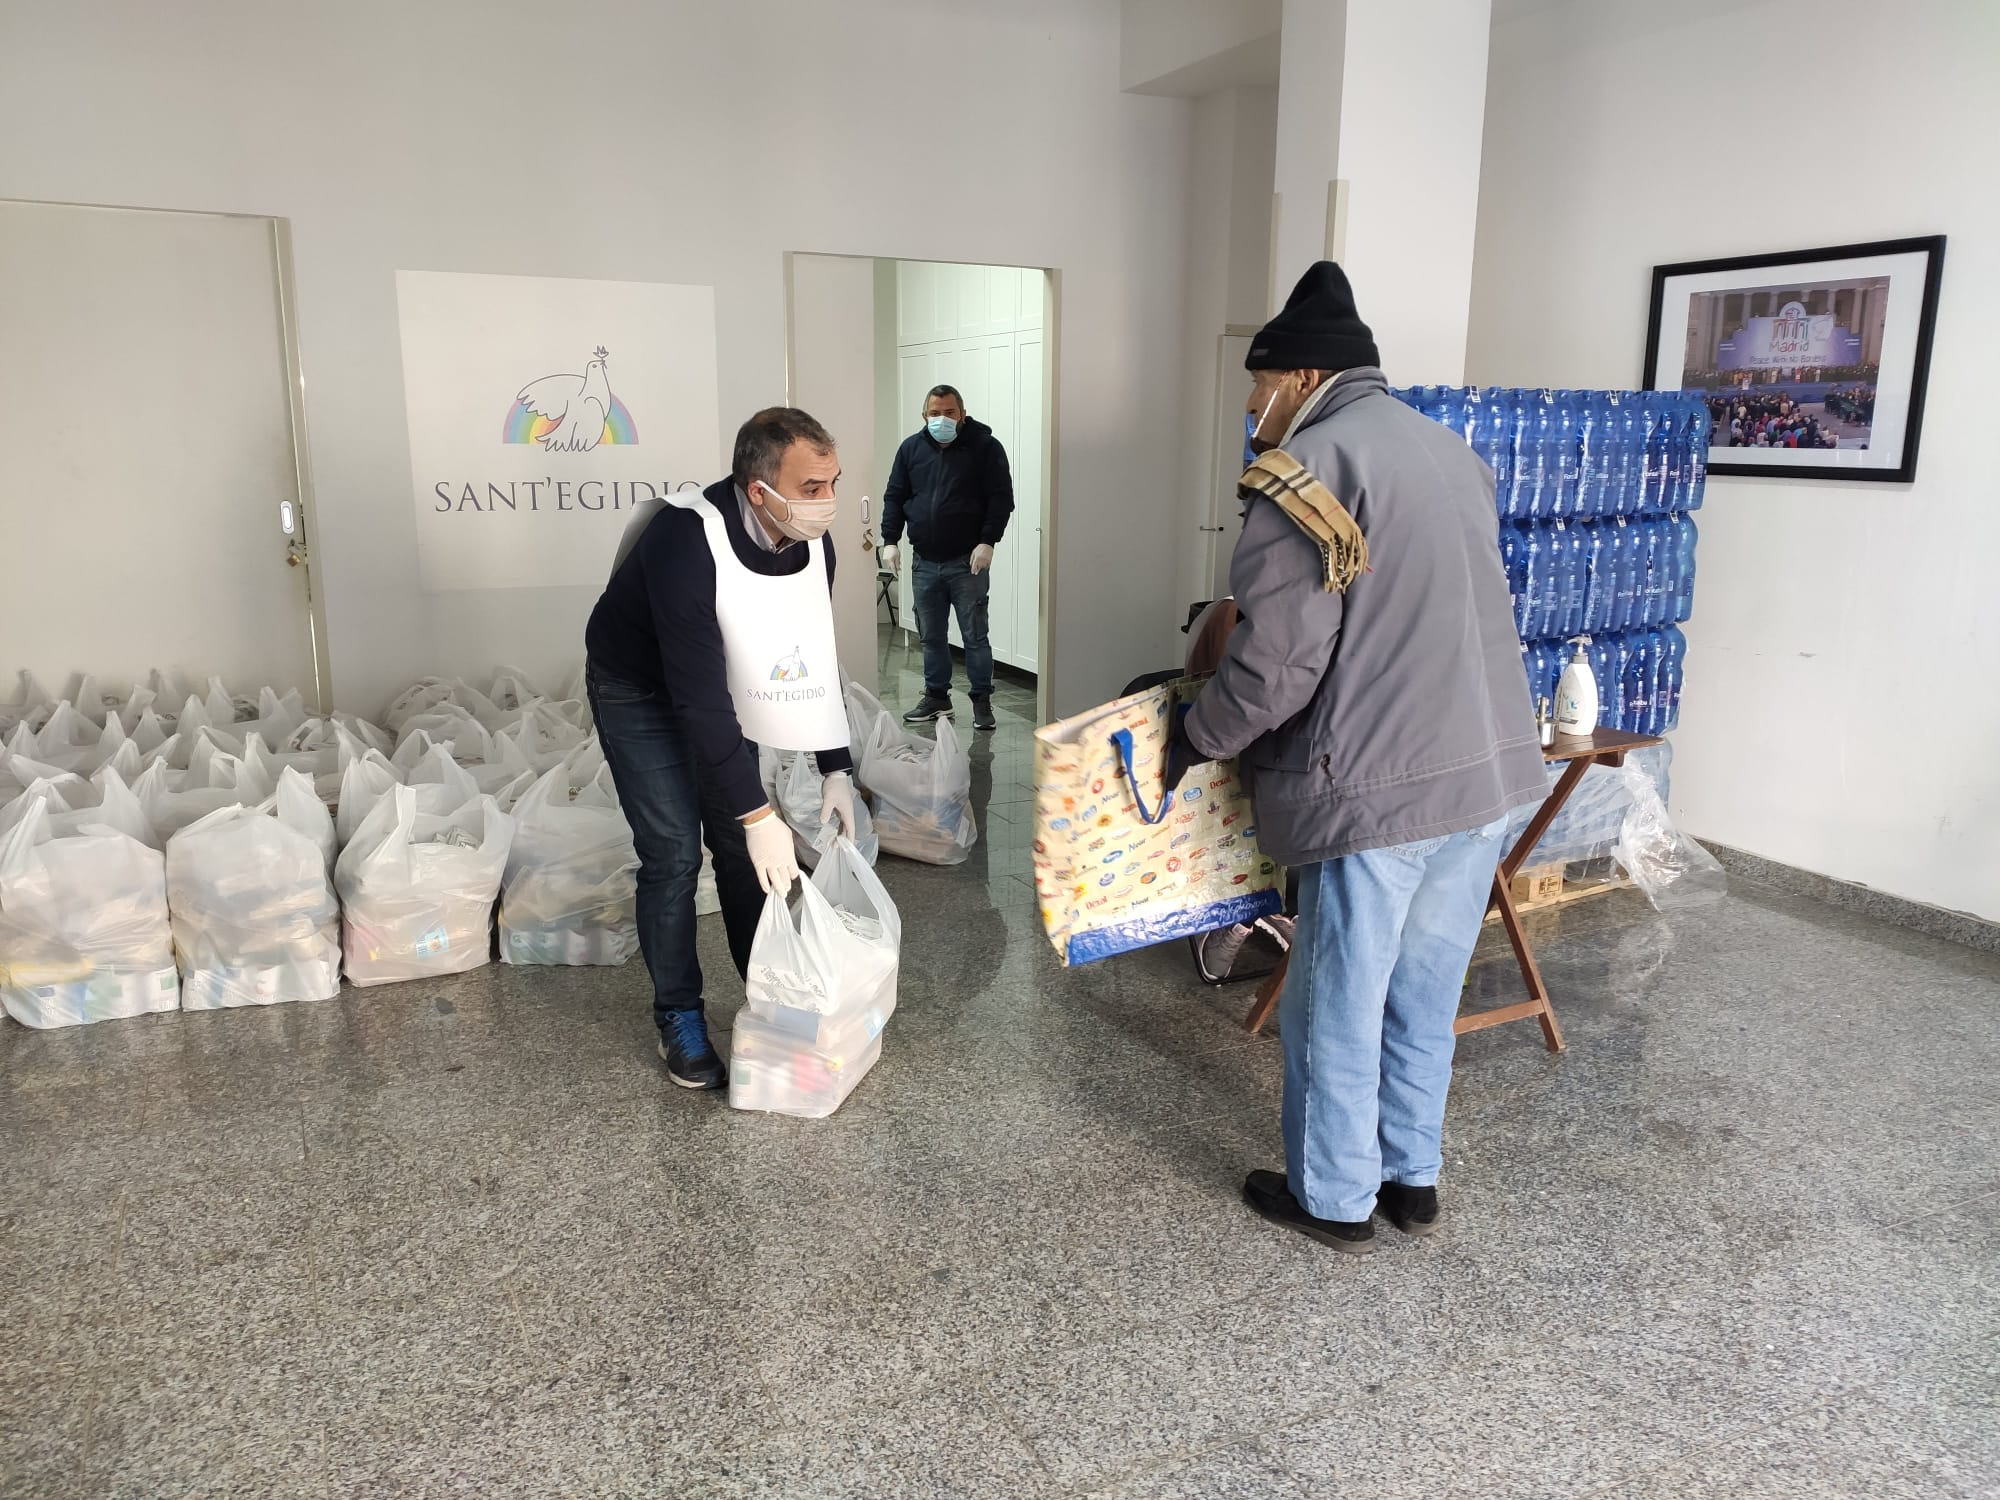 Gara di solidarietà, Faranda stacca assegno e sostiene 1000 famiglie